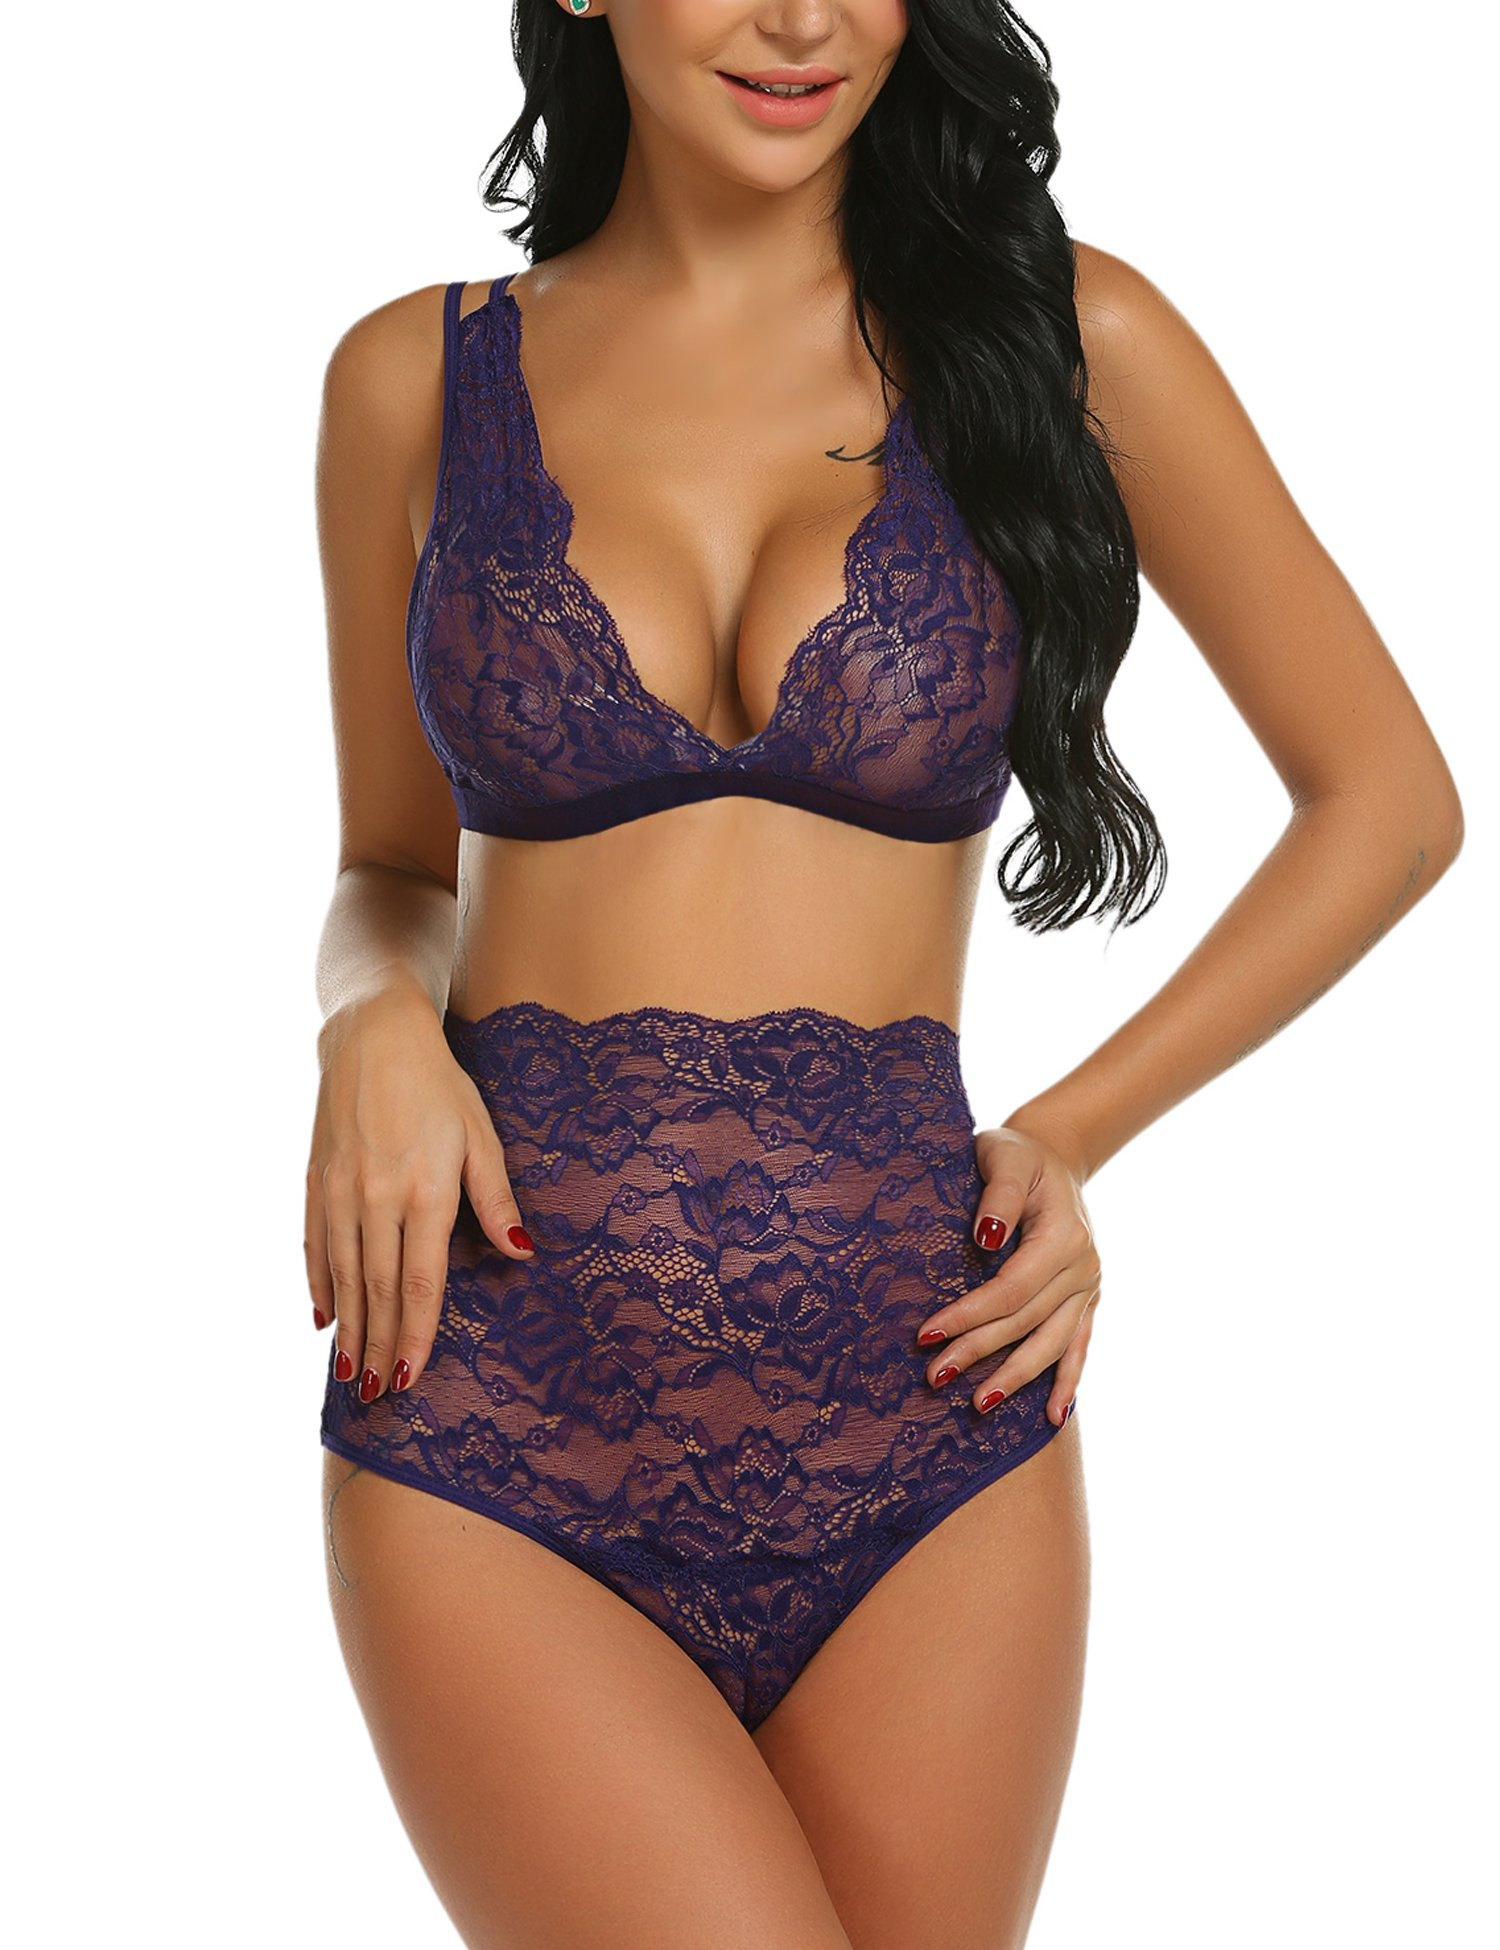 Avidlove Women's Lace Lingerie High Waist Bra and Panty Set Strappy Babydoll Bodysuit Purple M